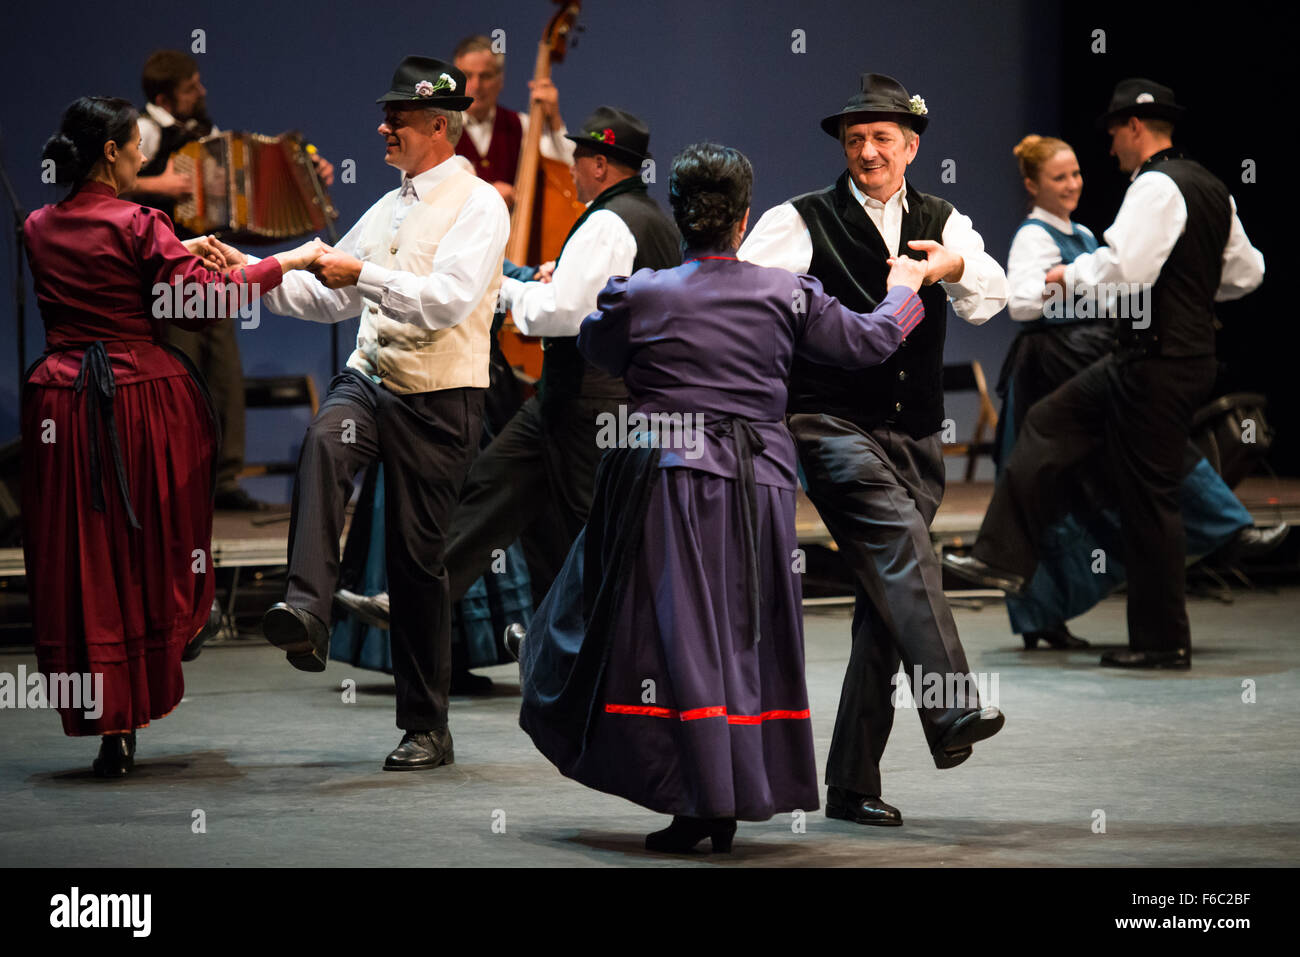 Grupo Folclórico esloveno actuarán en el 27 Festival Internacional de Folclore Folkart CIOFF, Festival Imagen De Stock